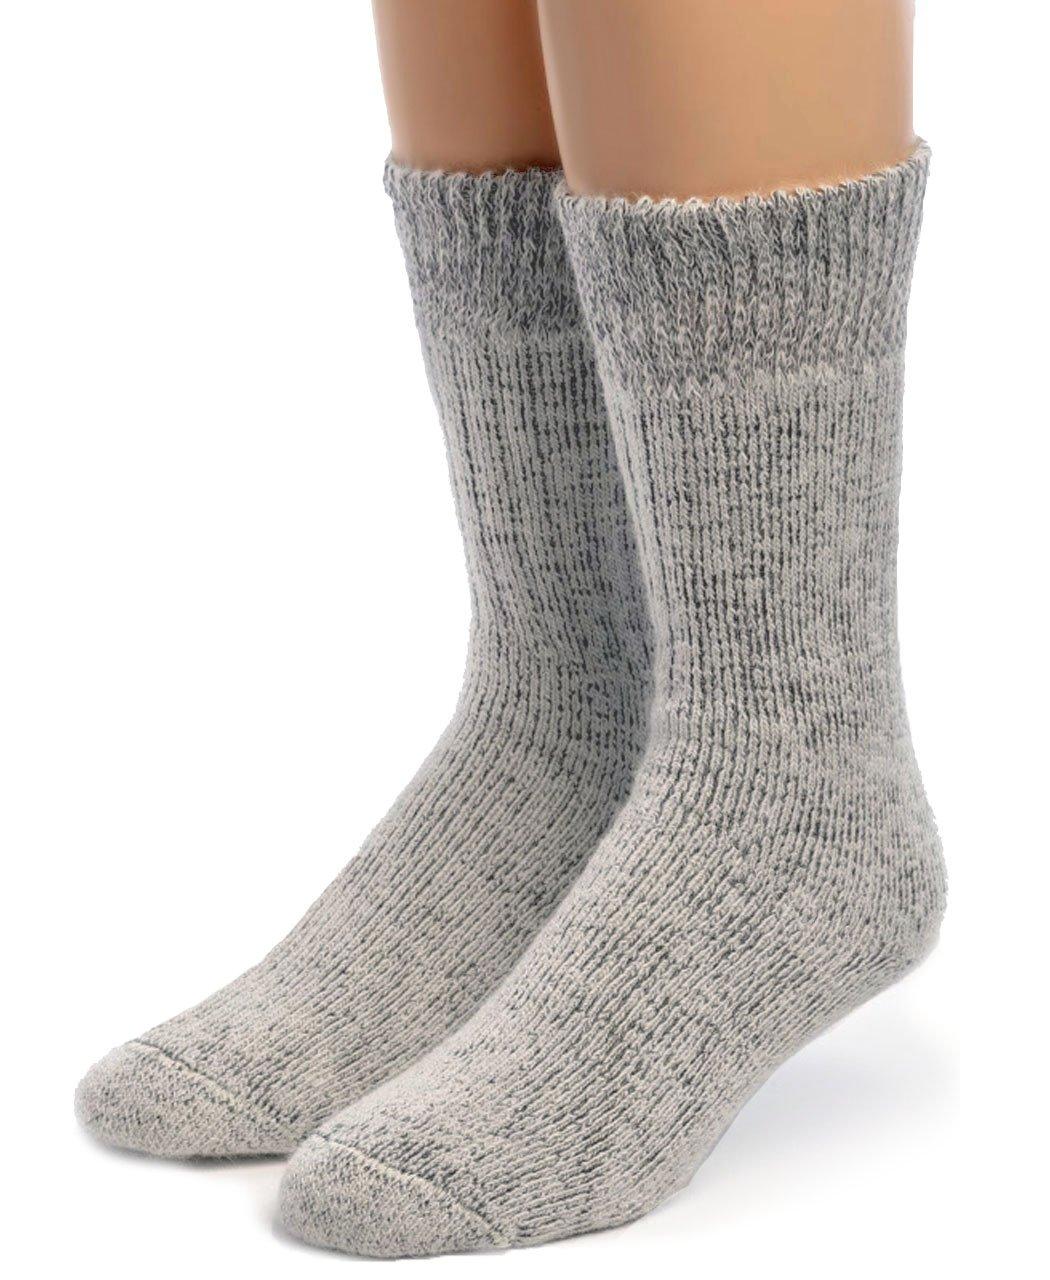 Warrior Alpaca Socks - Boy's Ultimate Alpaca Socks White/Cinder S